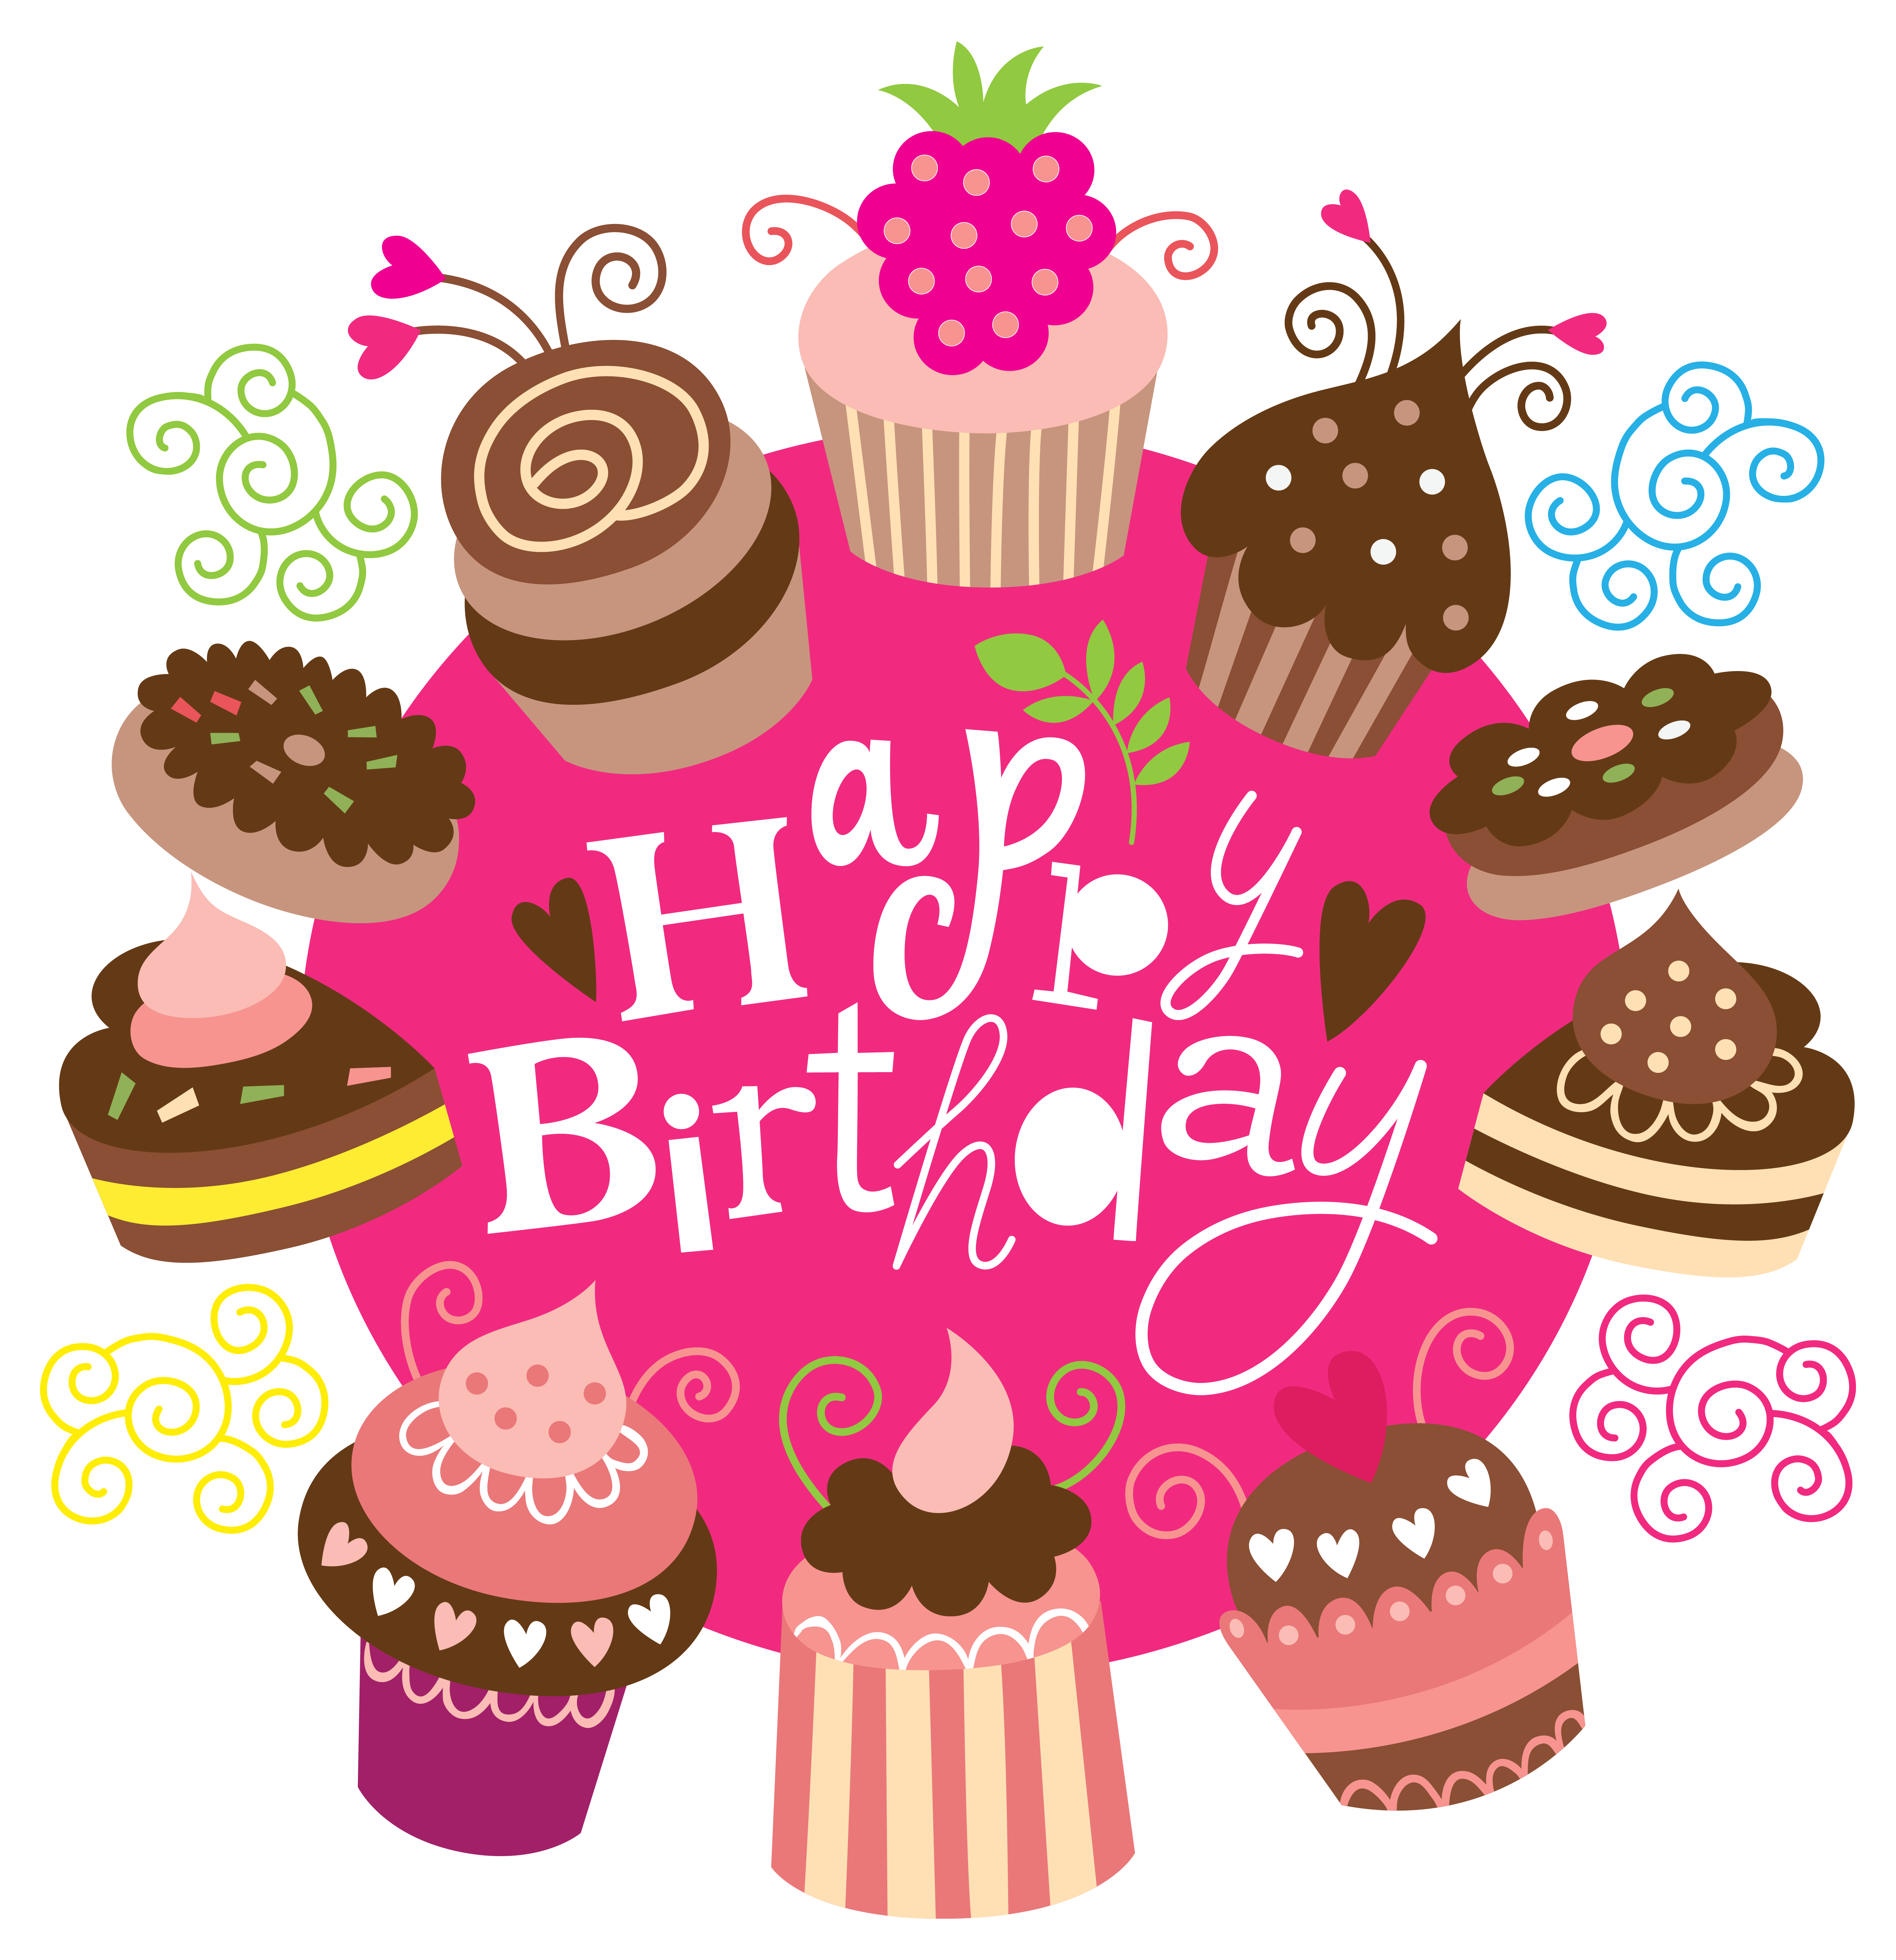 Free Birthday Clipart Image.